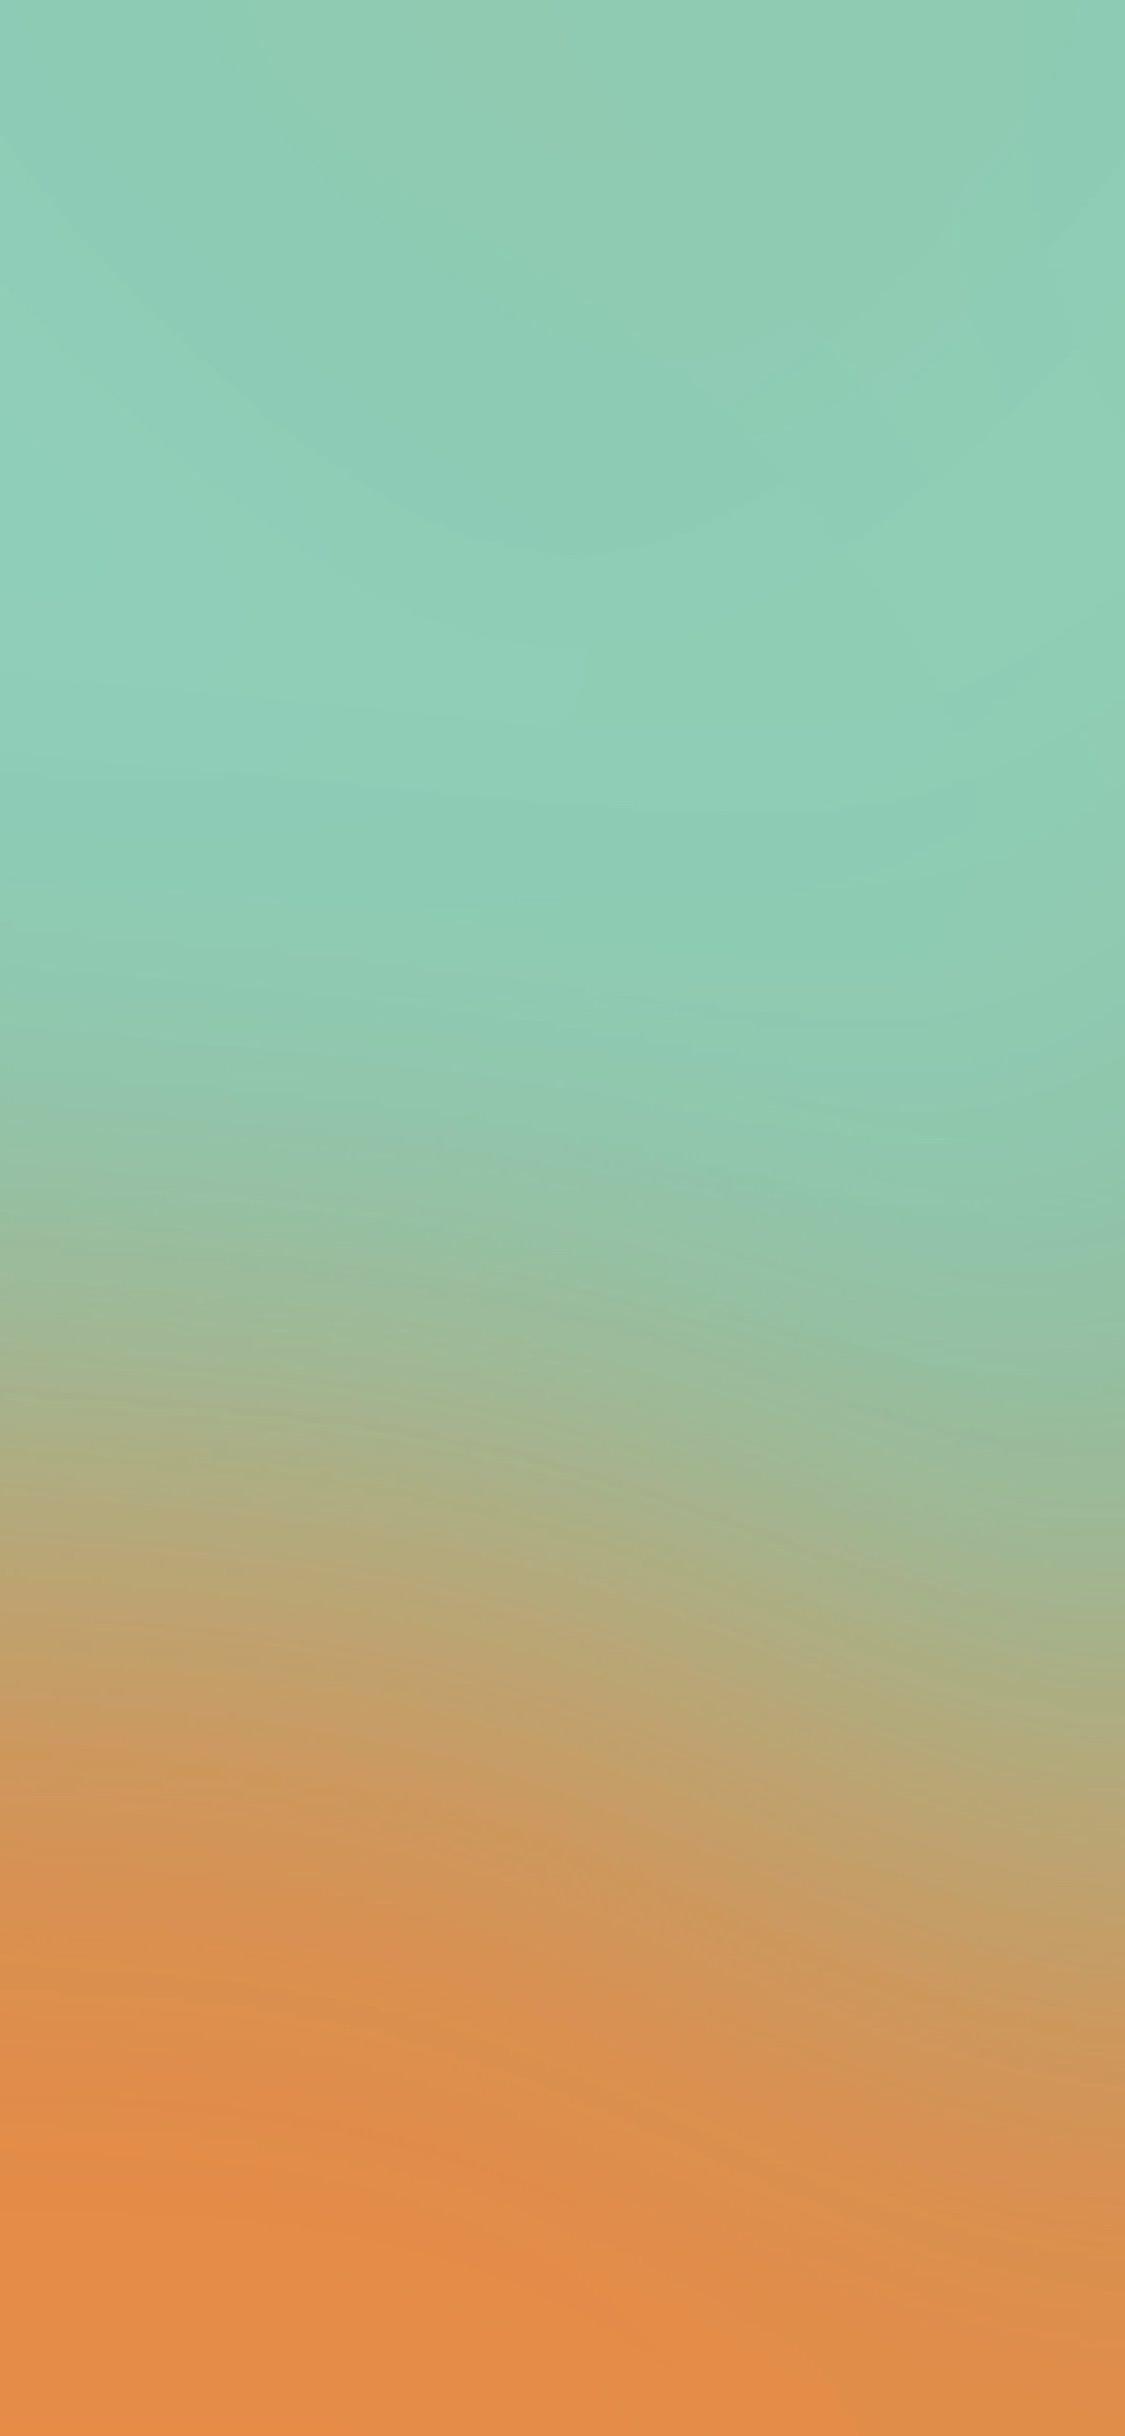 iPhone X 壁紙 wallpaper 0952